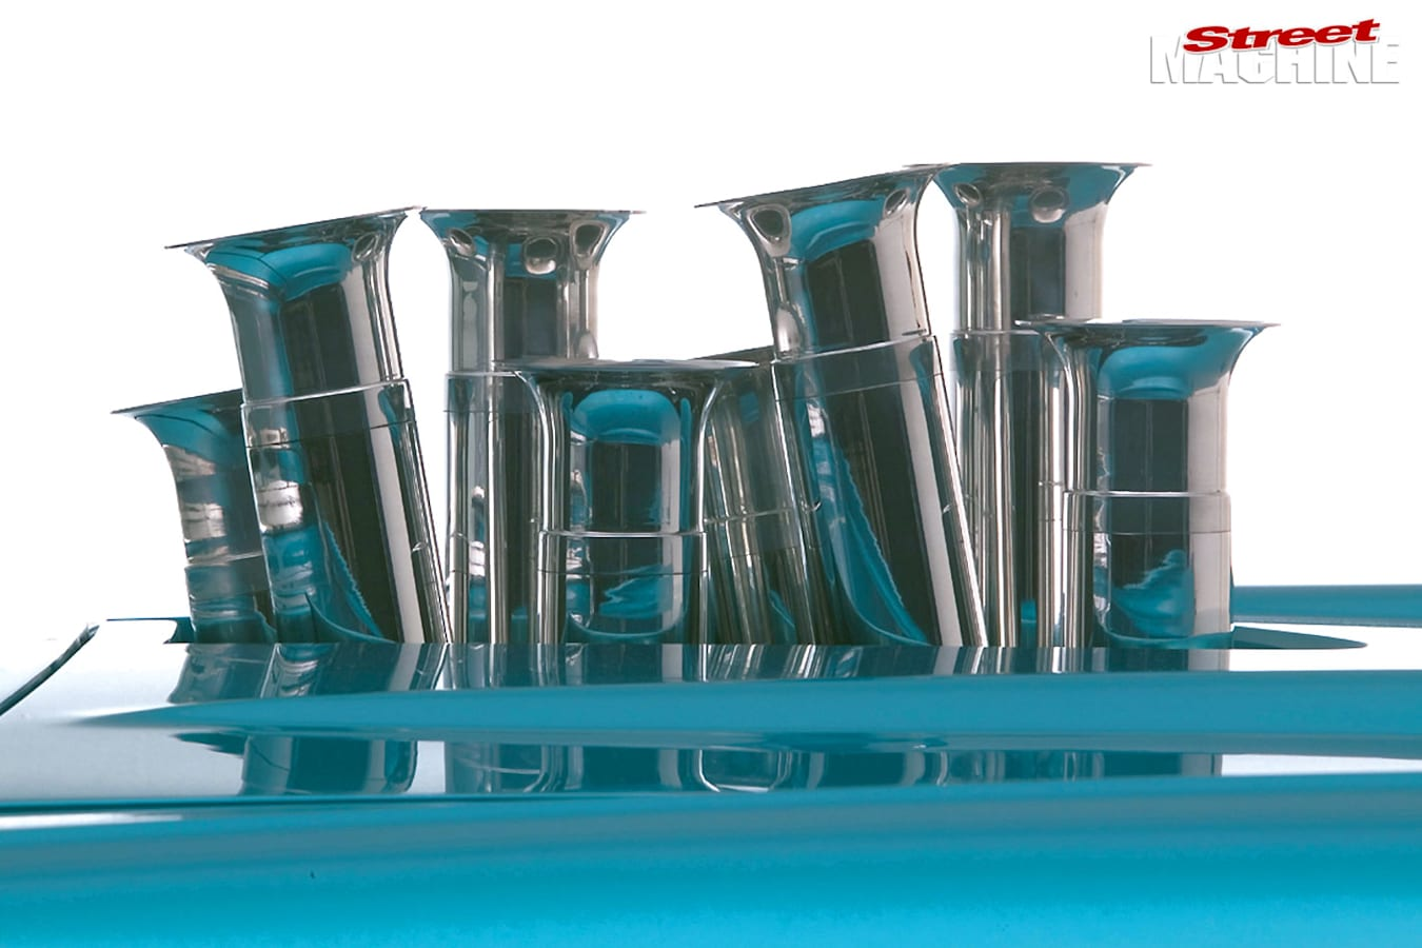 1957 Chev Bel Air trumpets